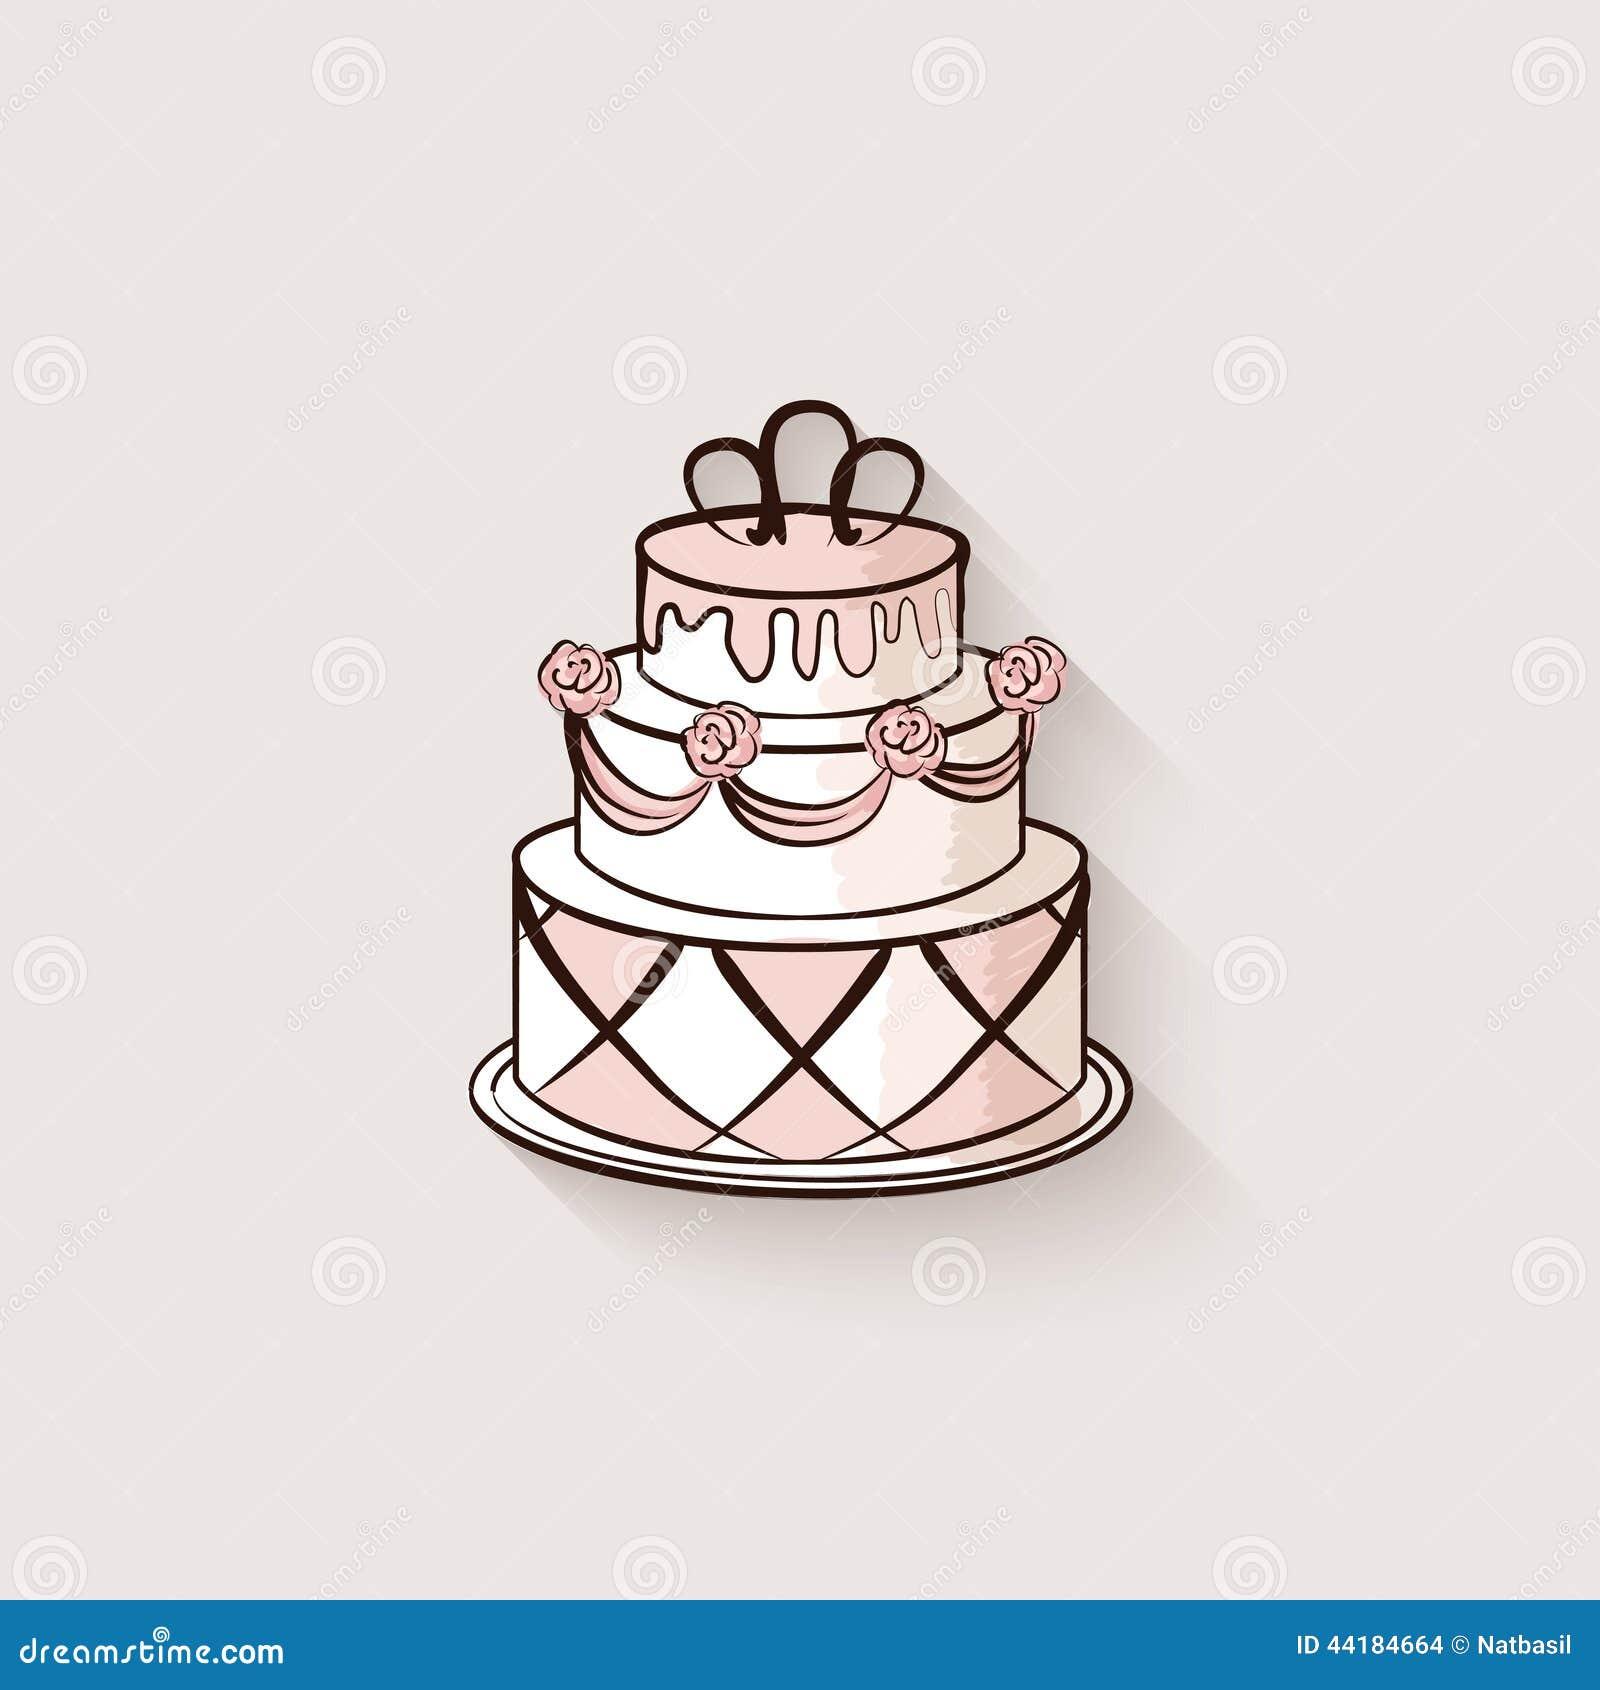 Wedding Cake Design Element Stock Vector - Image: 44184664